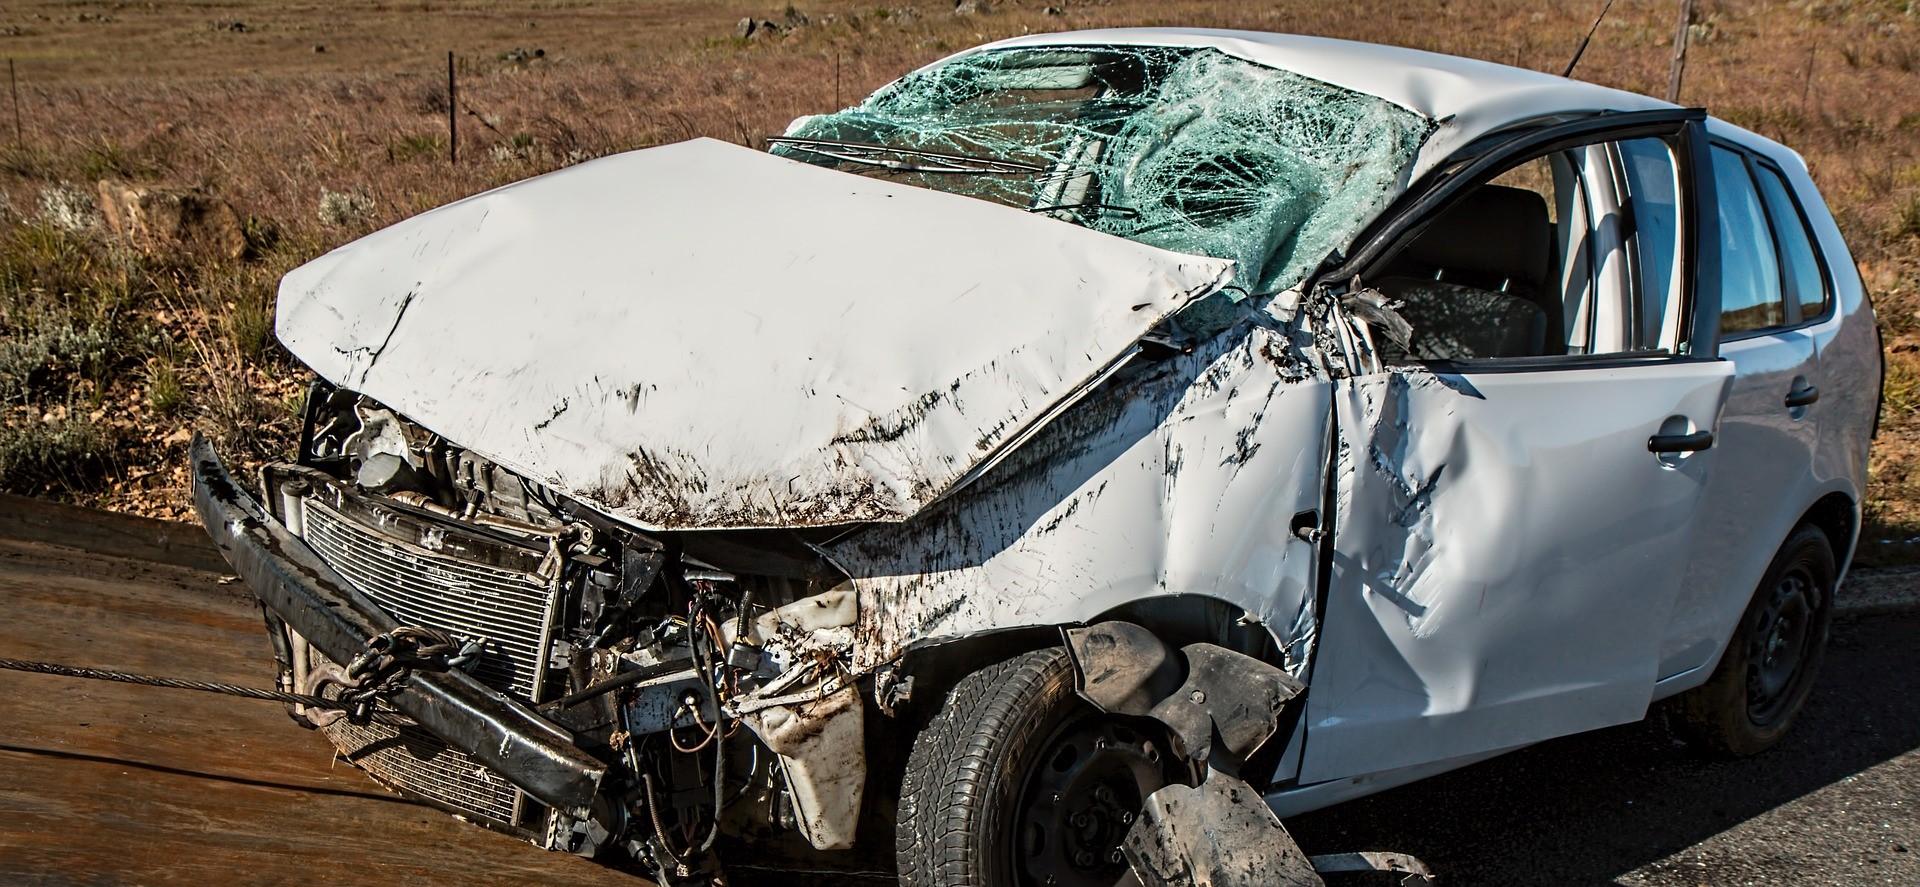 Pennsylvania Car Accident Lawyer